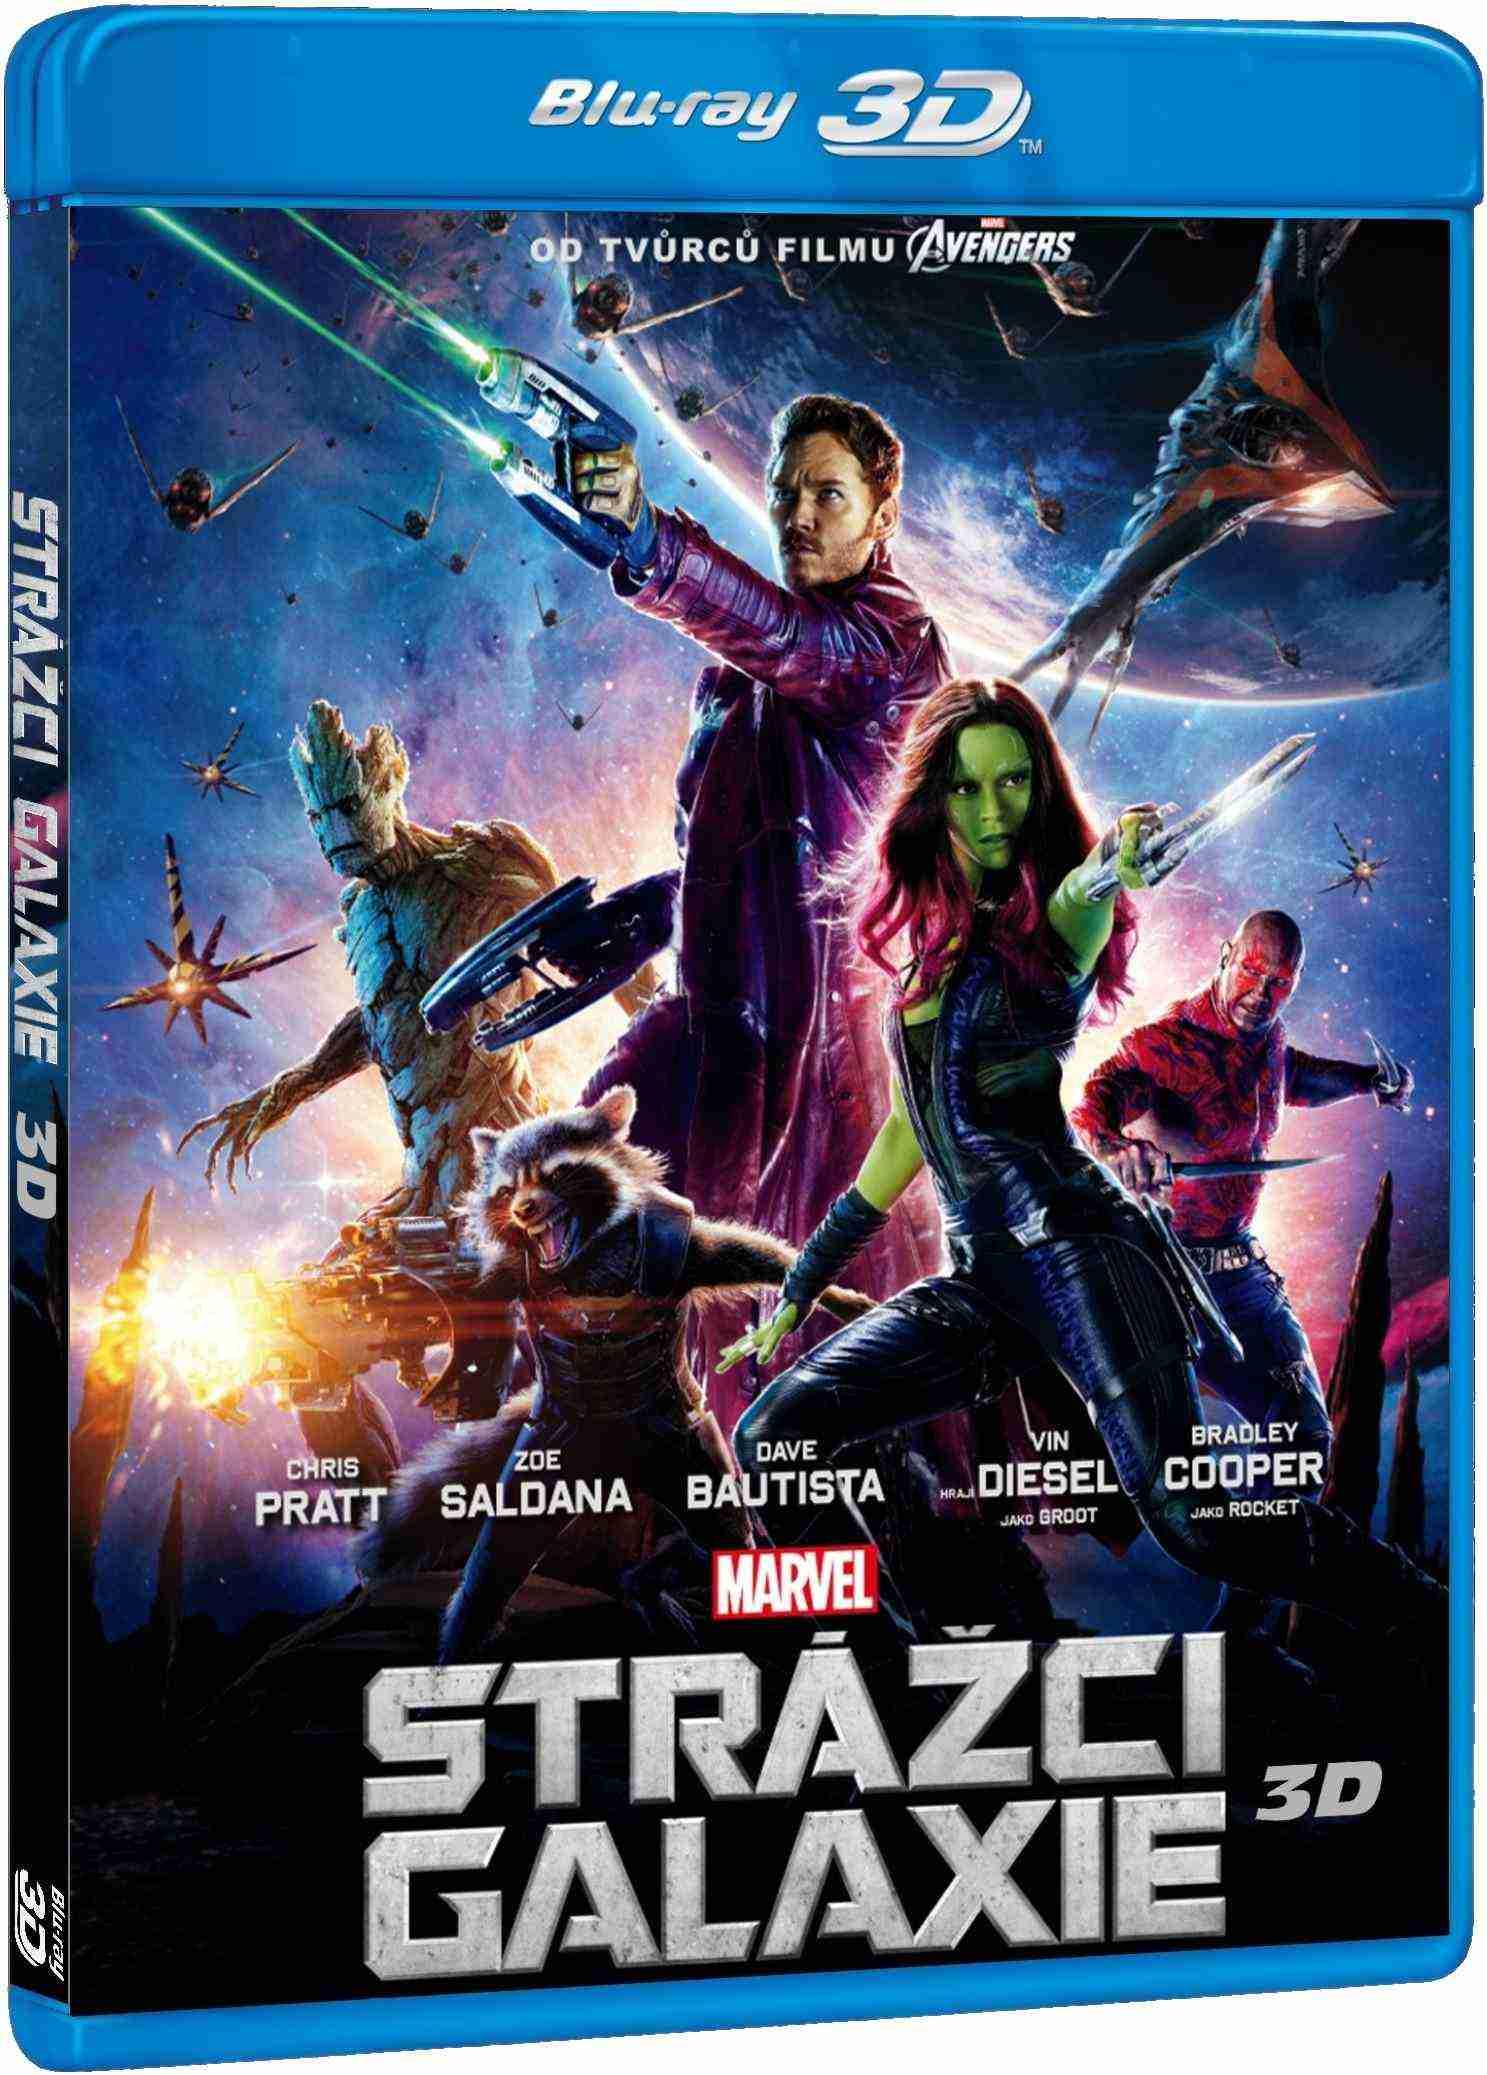 STRÁŽCI GALAXIE - Blu-ray 3D + 2D